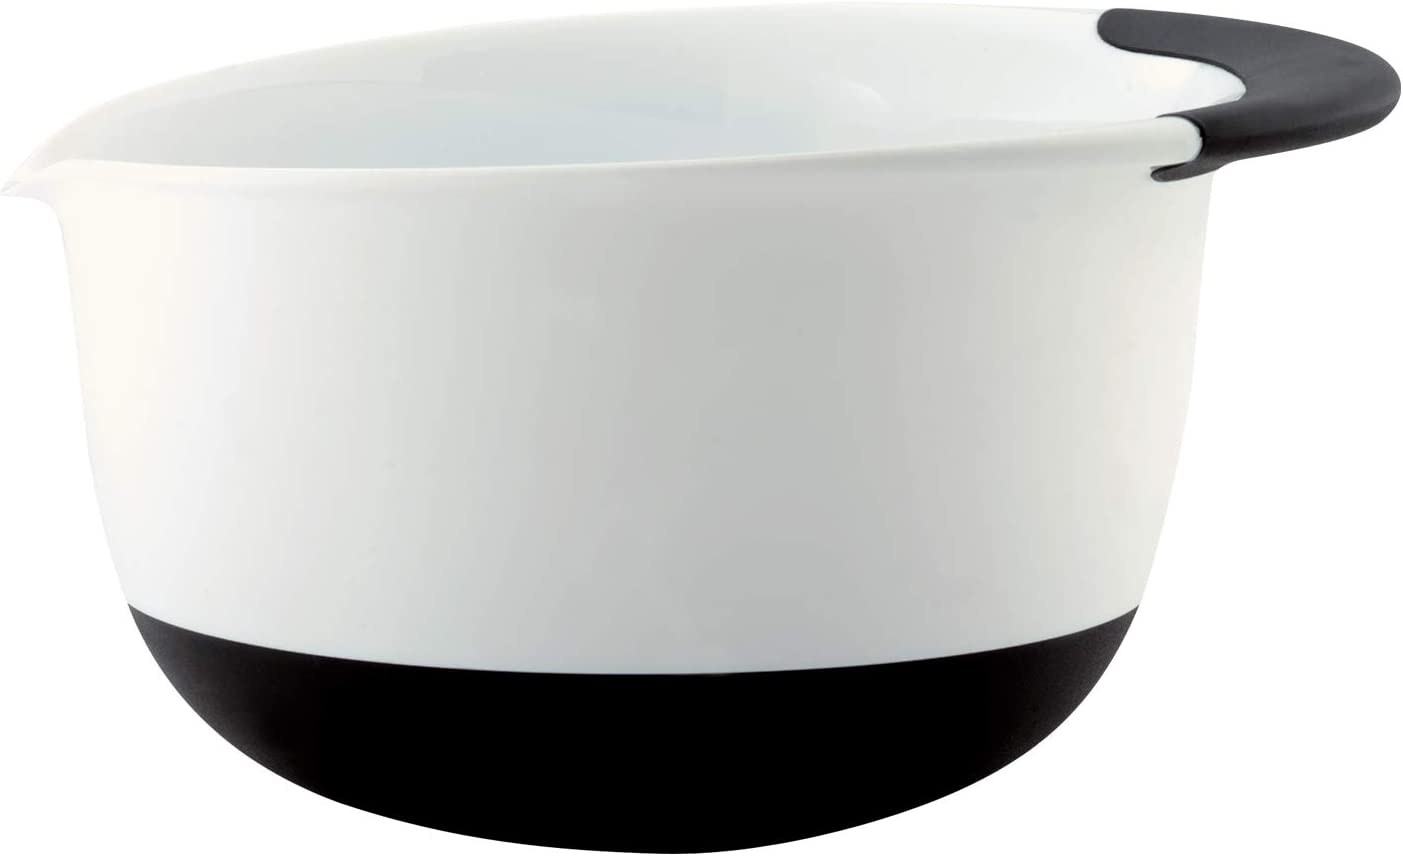 OXO Good Grips 5-Quart Mixing Bowl, 5 Quart